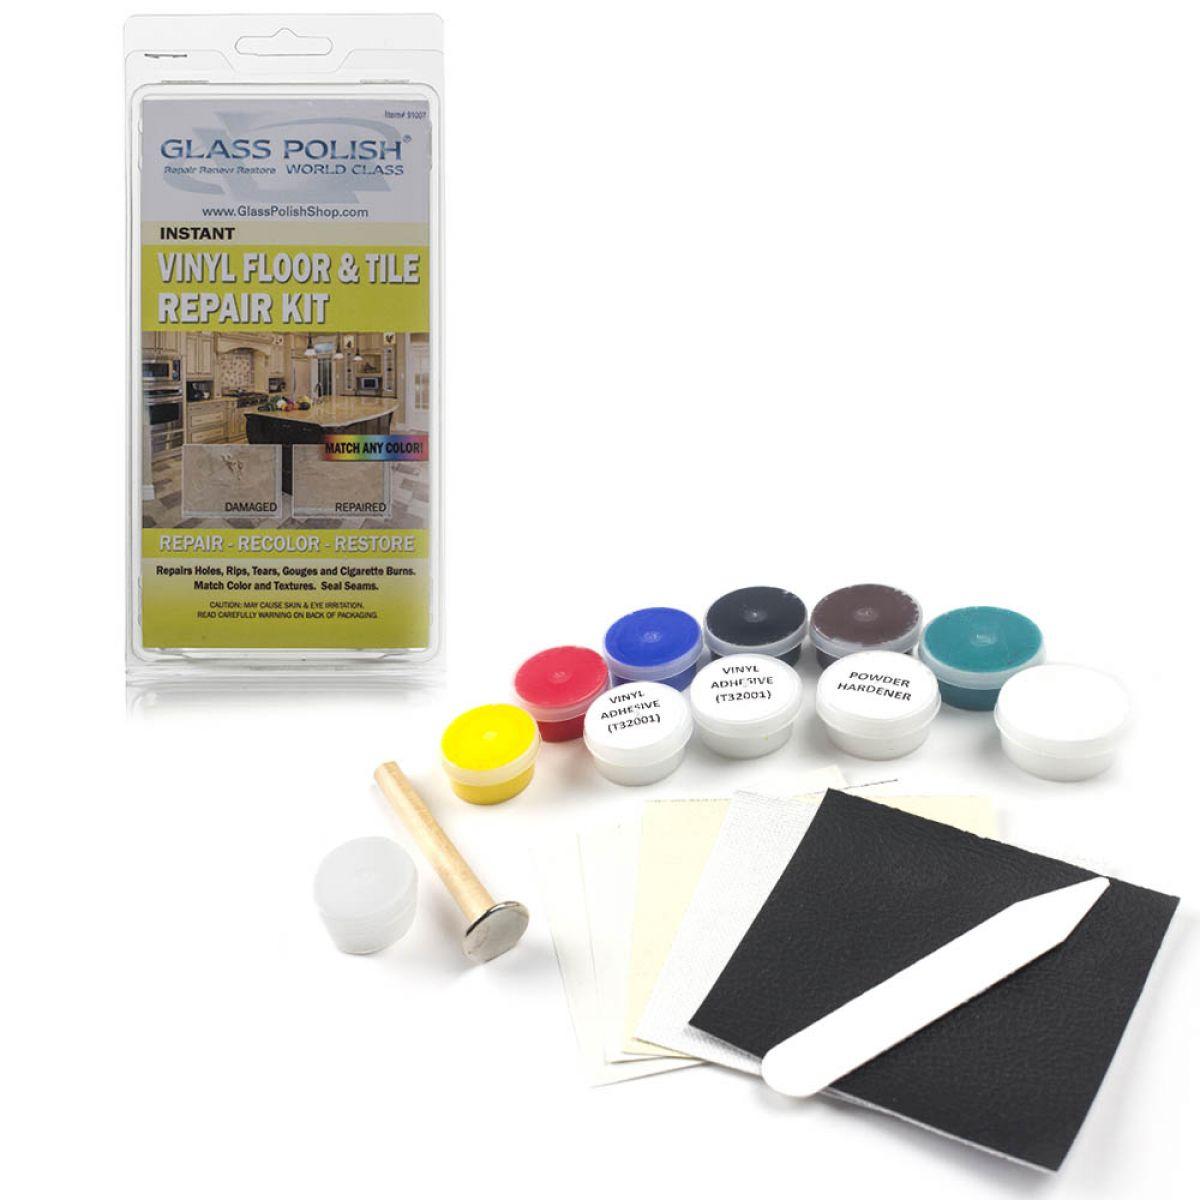 Glass Polish Vinyl Floor Repair Kit 91007